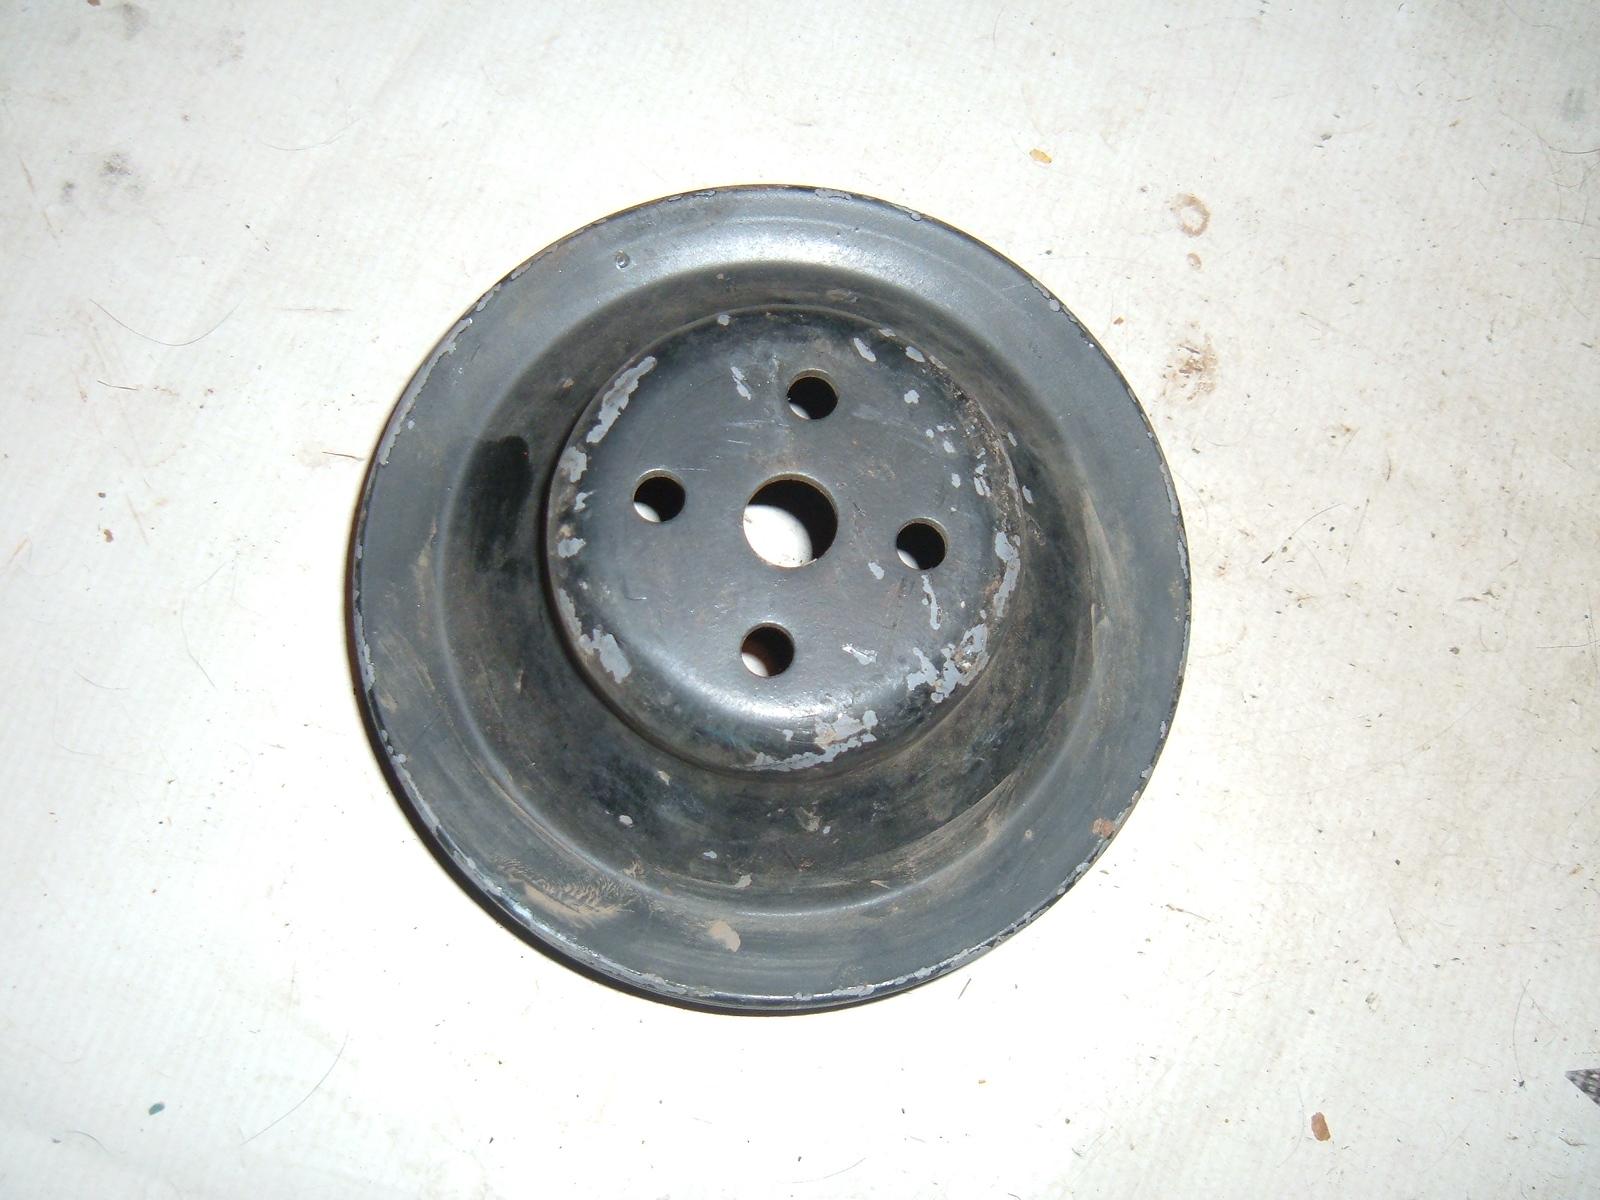 1964 65 66 67 68 corvette chevelle water pump pulley nos gm 3890419